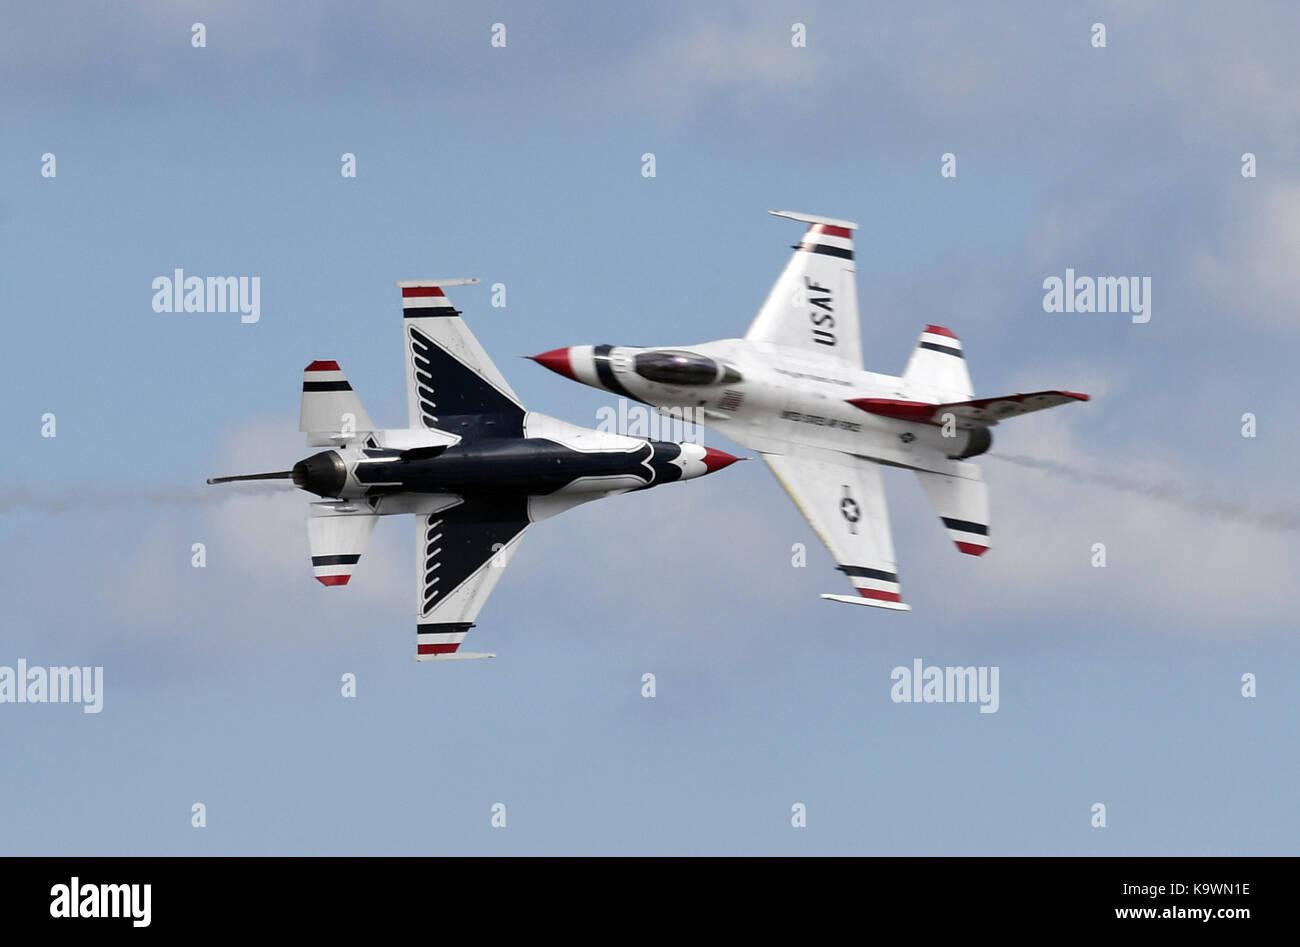 Beijing, USA. 16th Sep, 2017. U.S. Air Force Thunderbirds perform aerobatics during an air show celebrating the Stock Photo